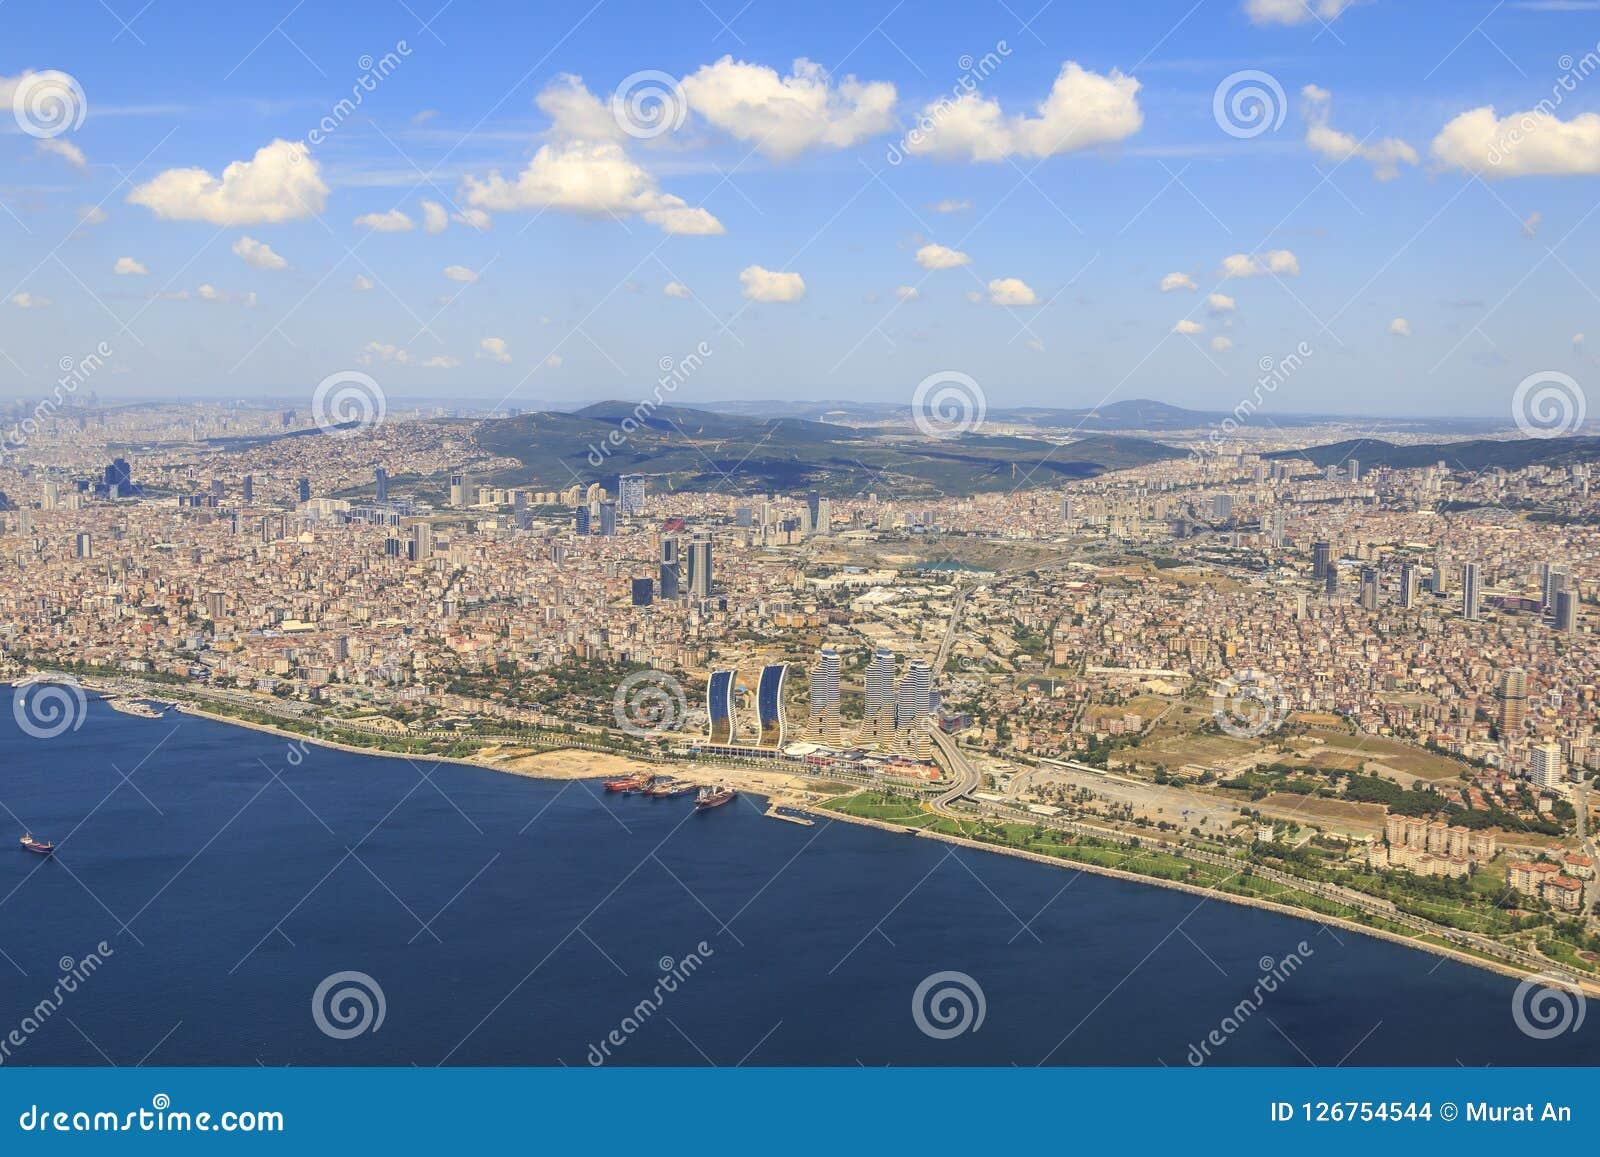 Maltepe And Kartal Part Asian Side Of Istanbul Turkey Stock Photo